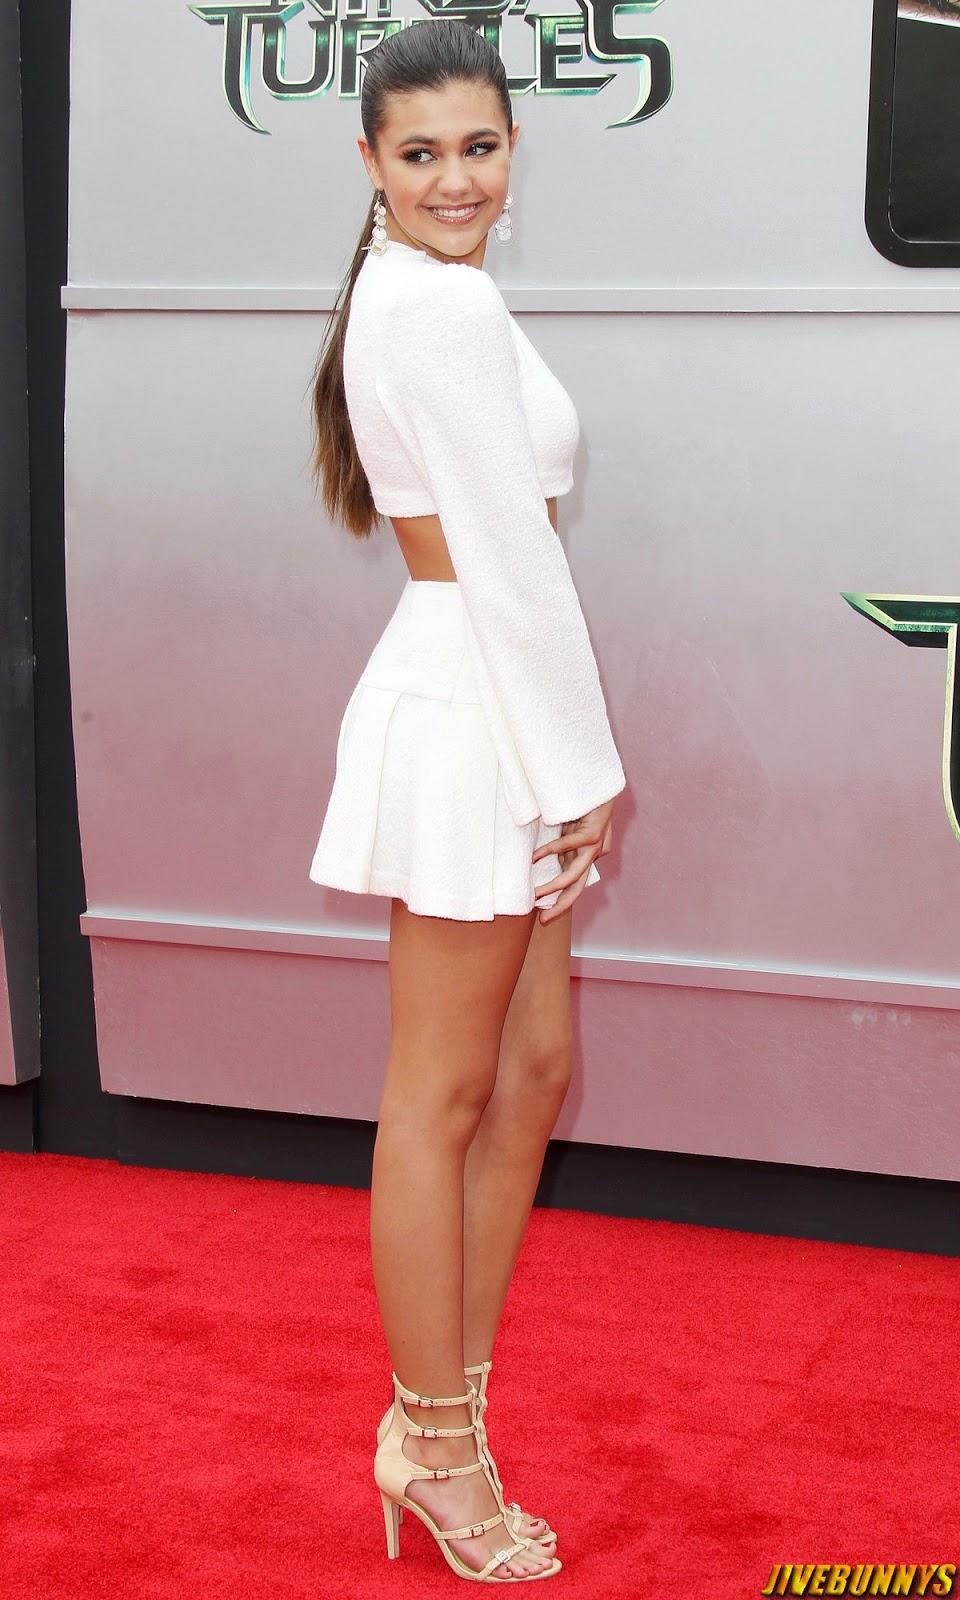 jivebunnys female celebrity picture gallery amber montana actress